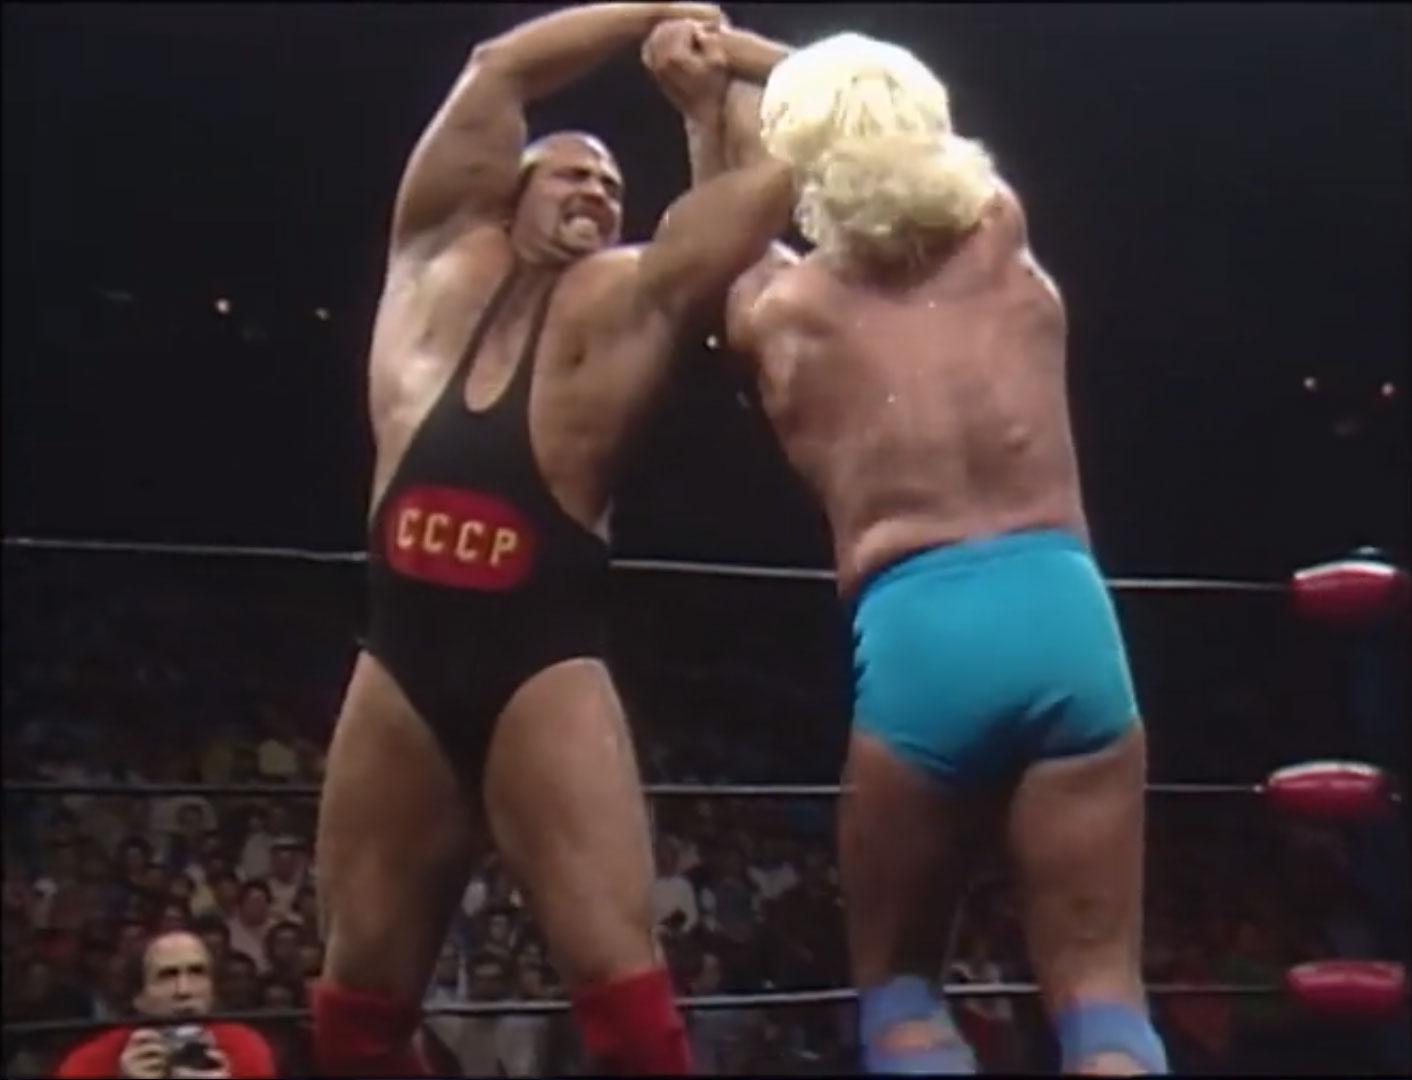 Ric Flair vs. Nikita Koloff NWA World Heavyweight Championship Starrcade '86, Nov 27th 1986